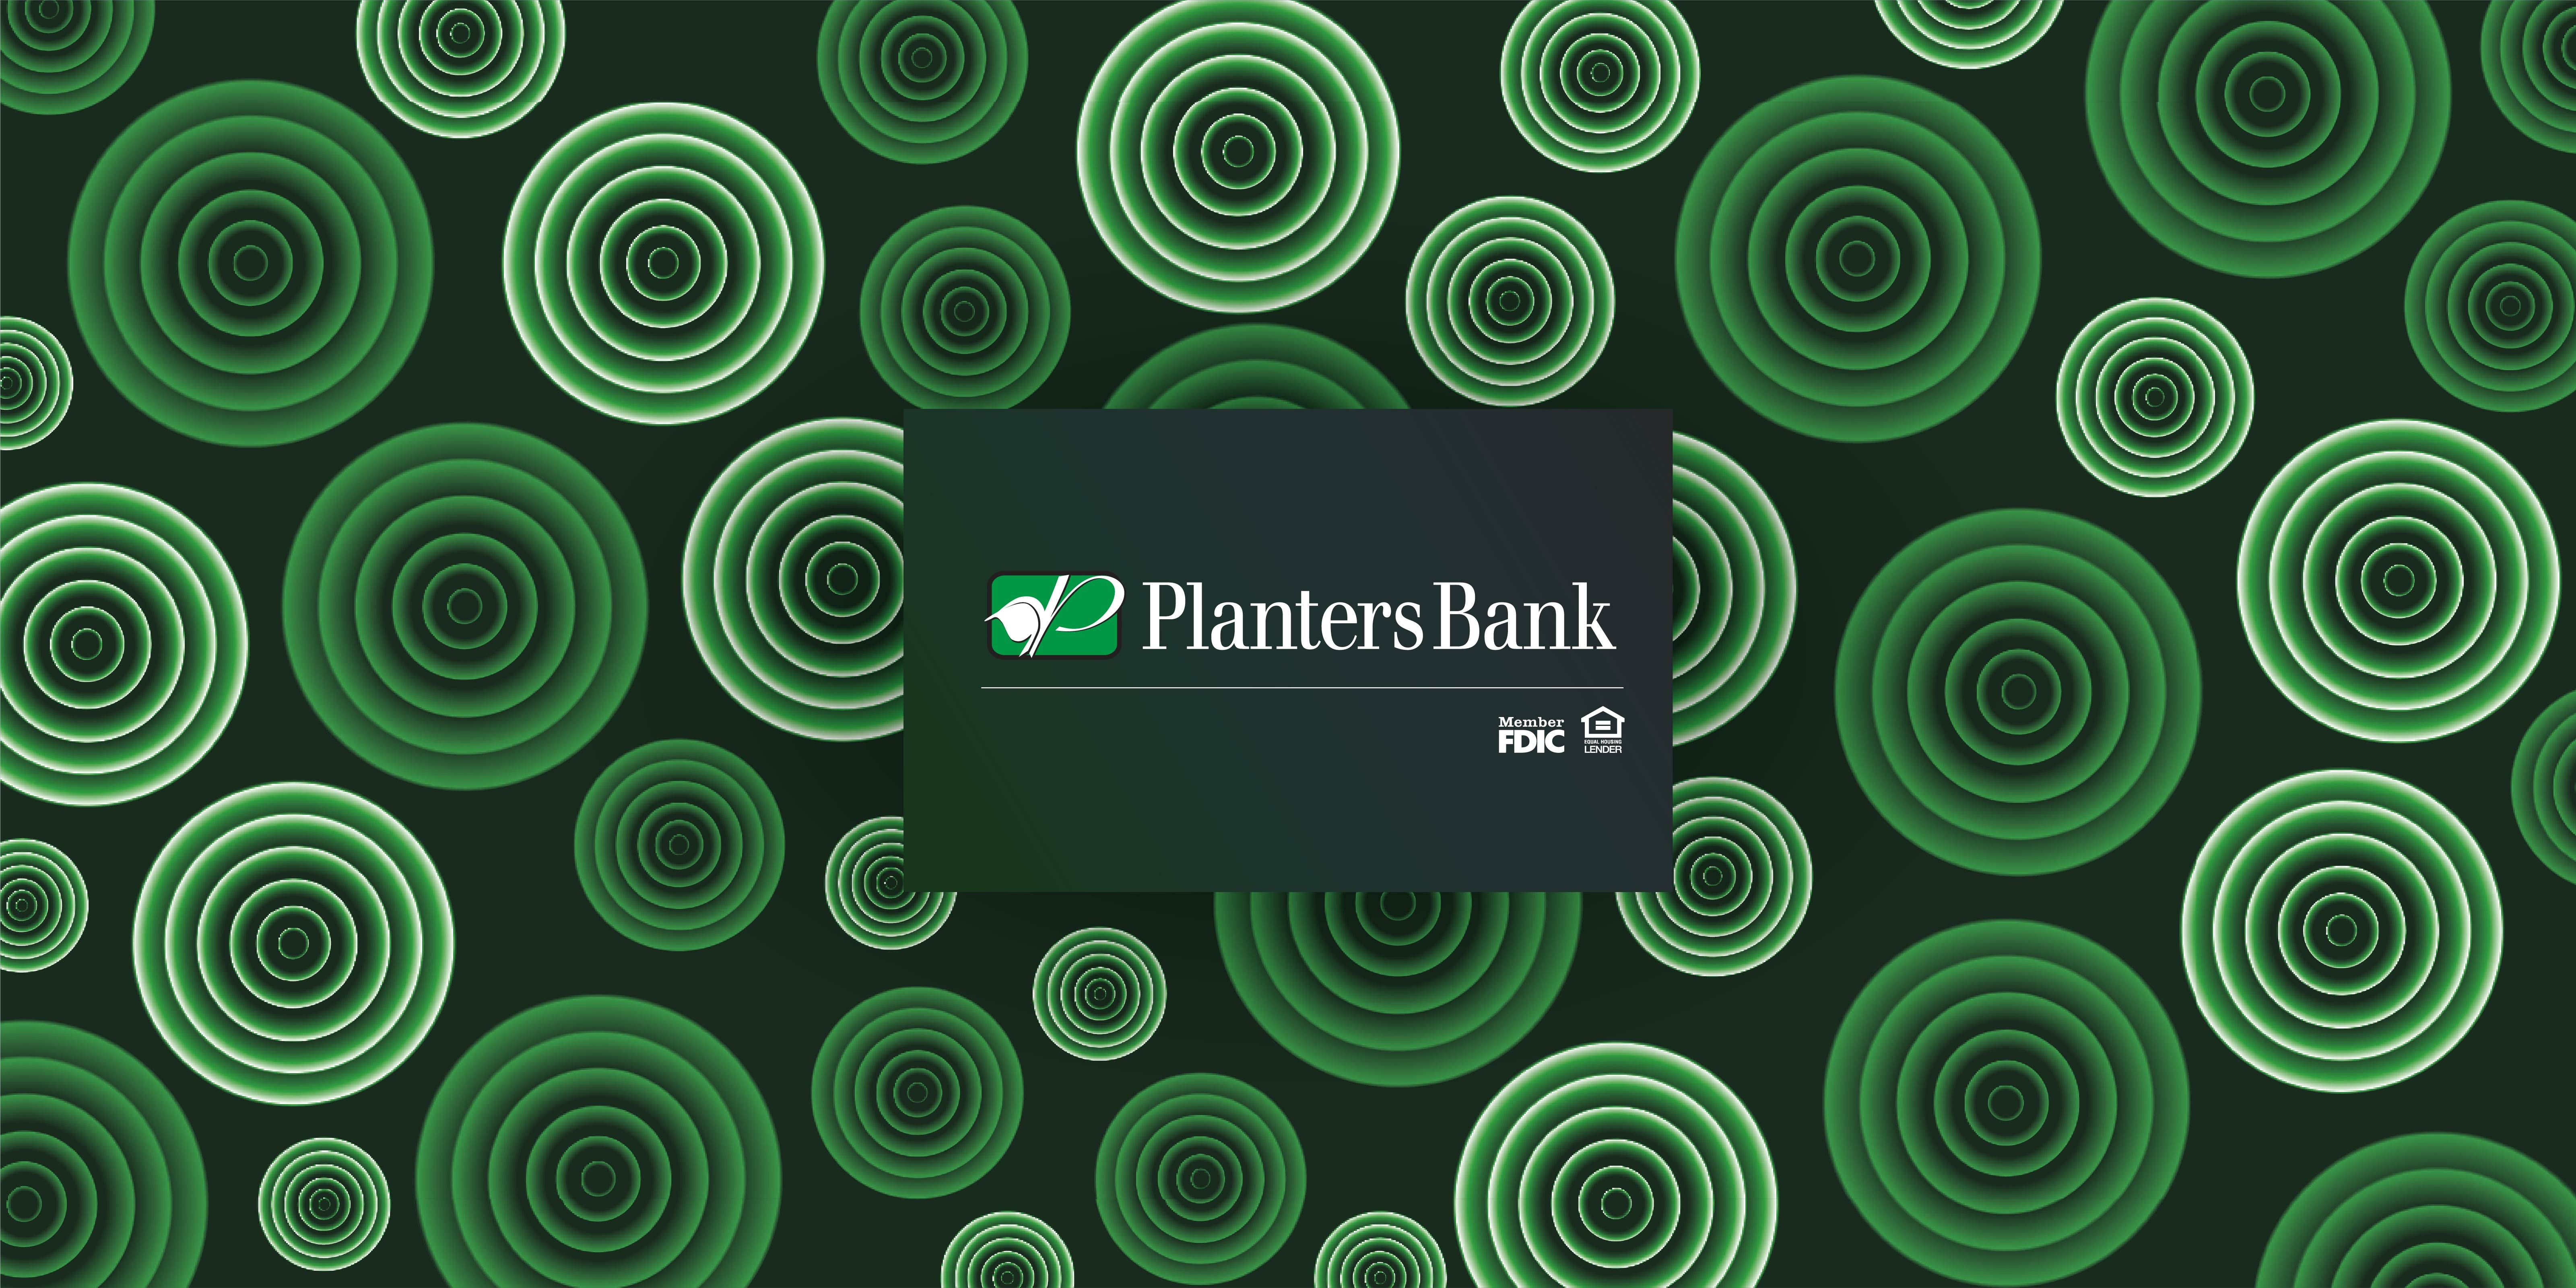 Planters Bank Linkedin